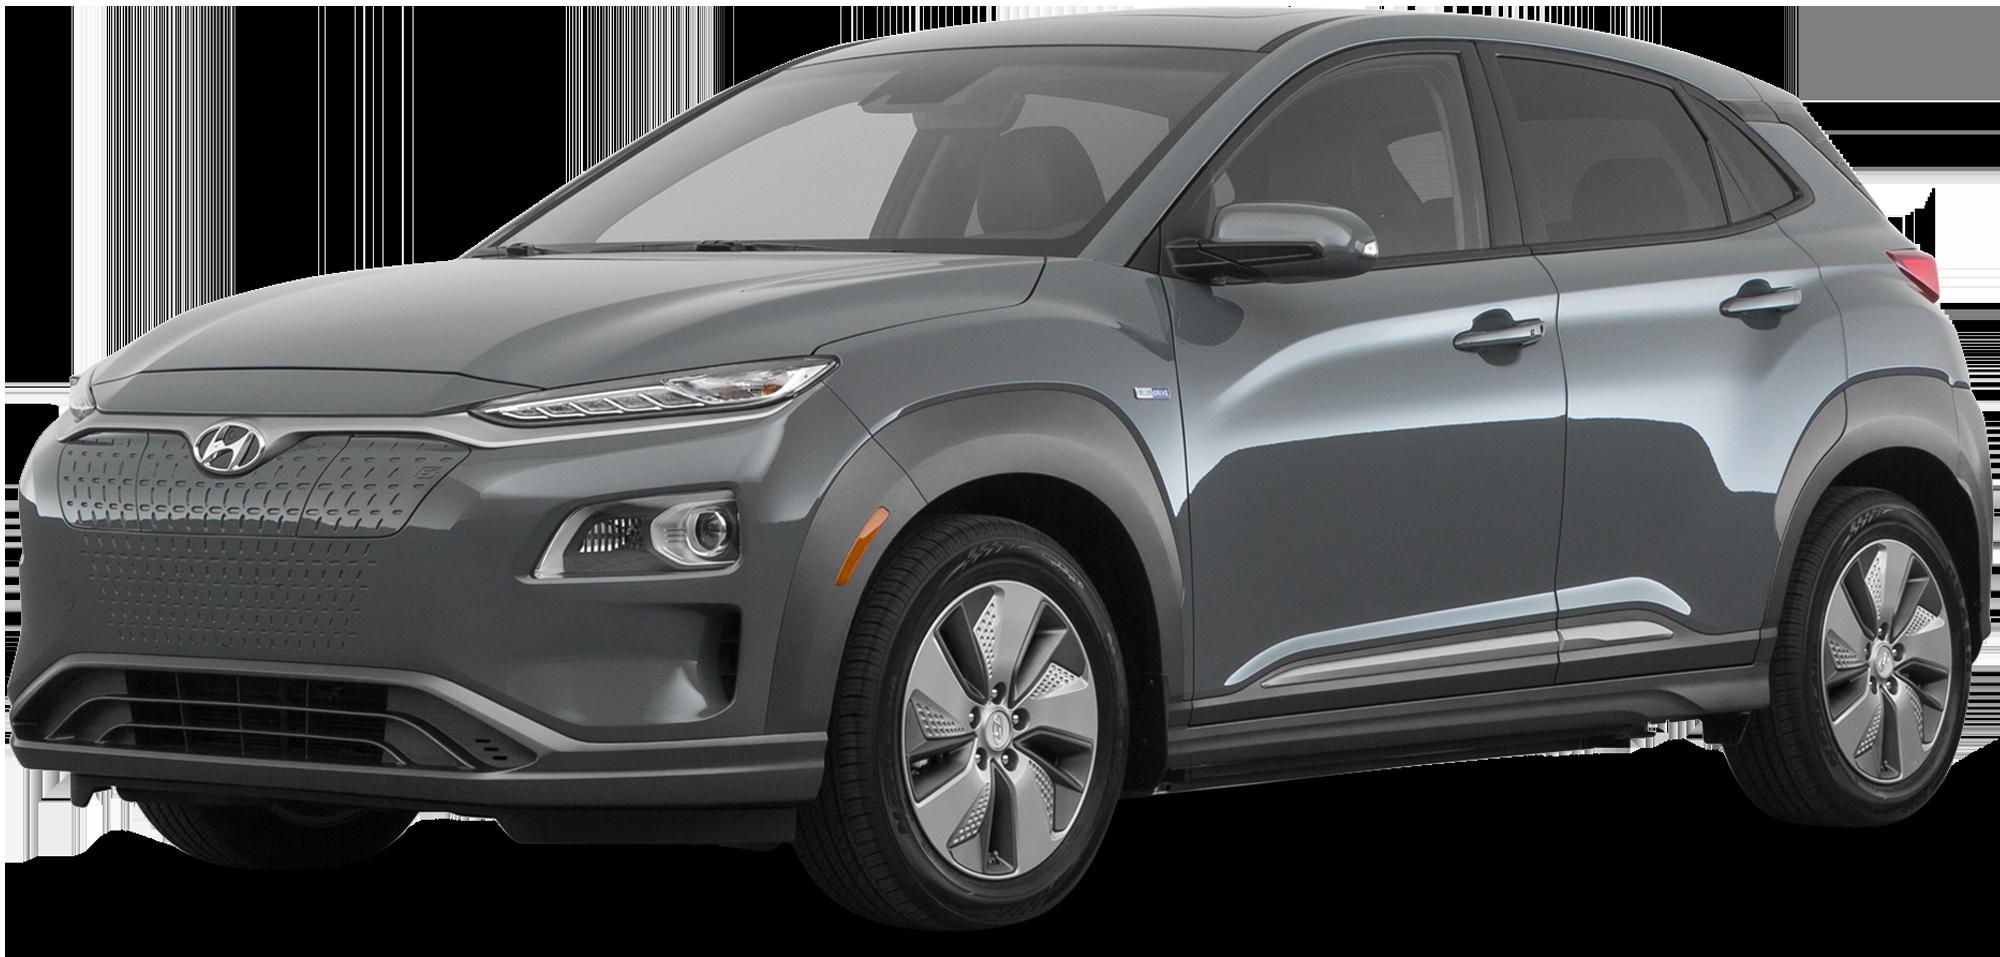 2019 Hyundai Kona EV Incentives, Specials & Offers In